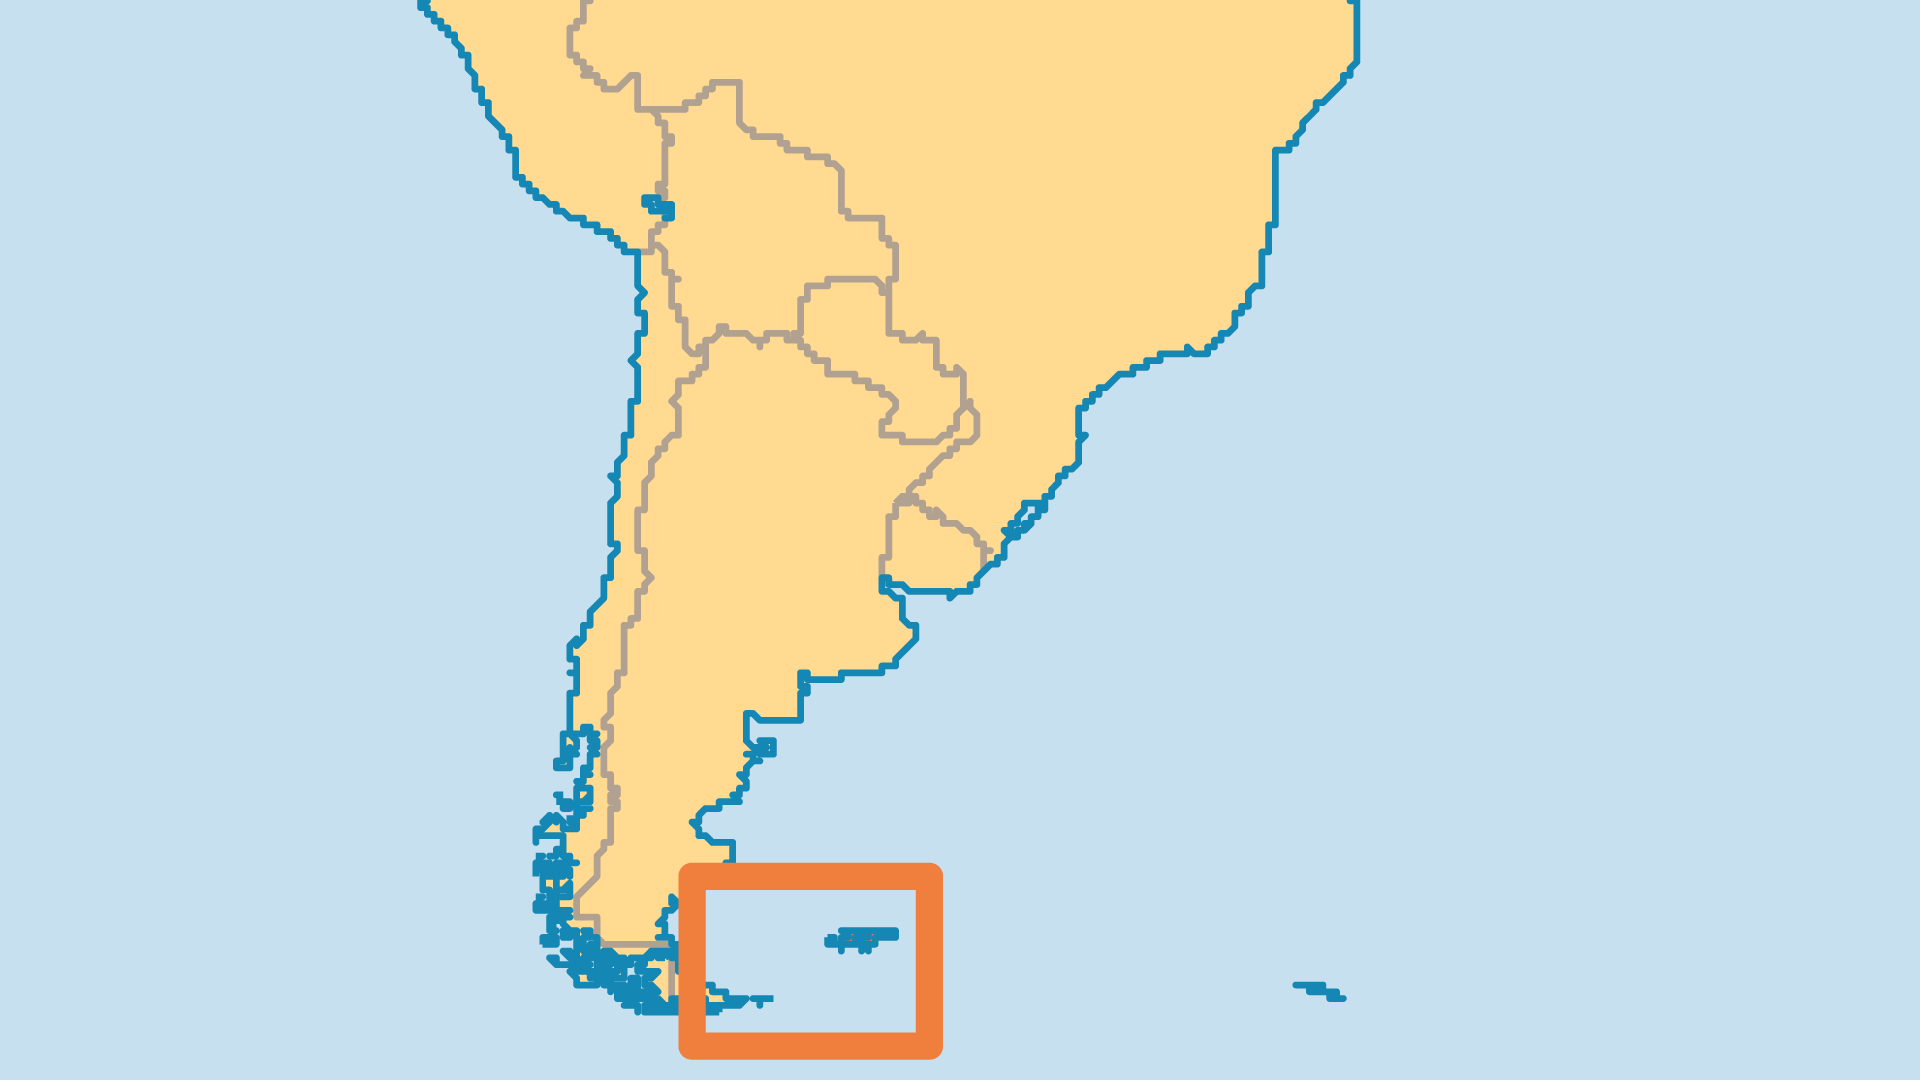 Locator Map for Falkland Islands